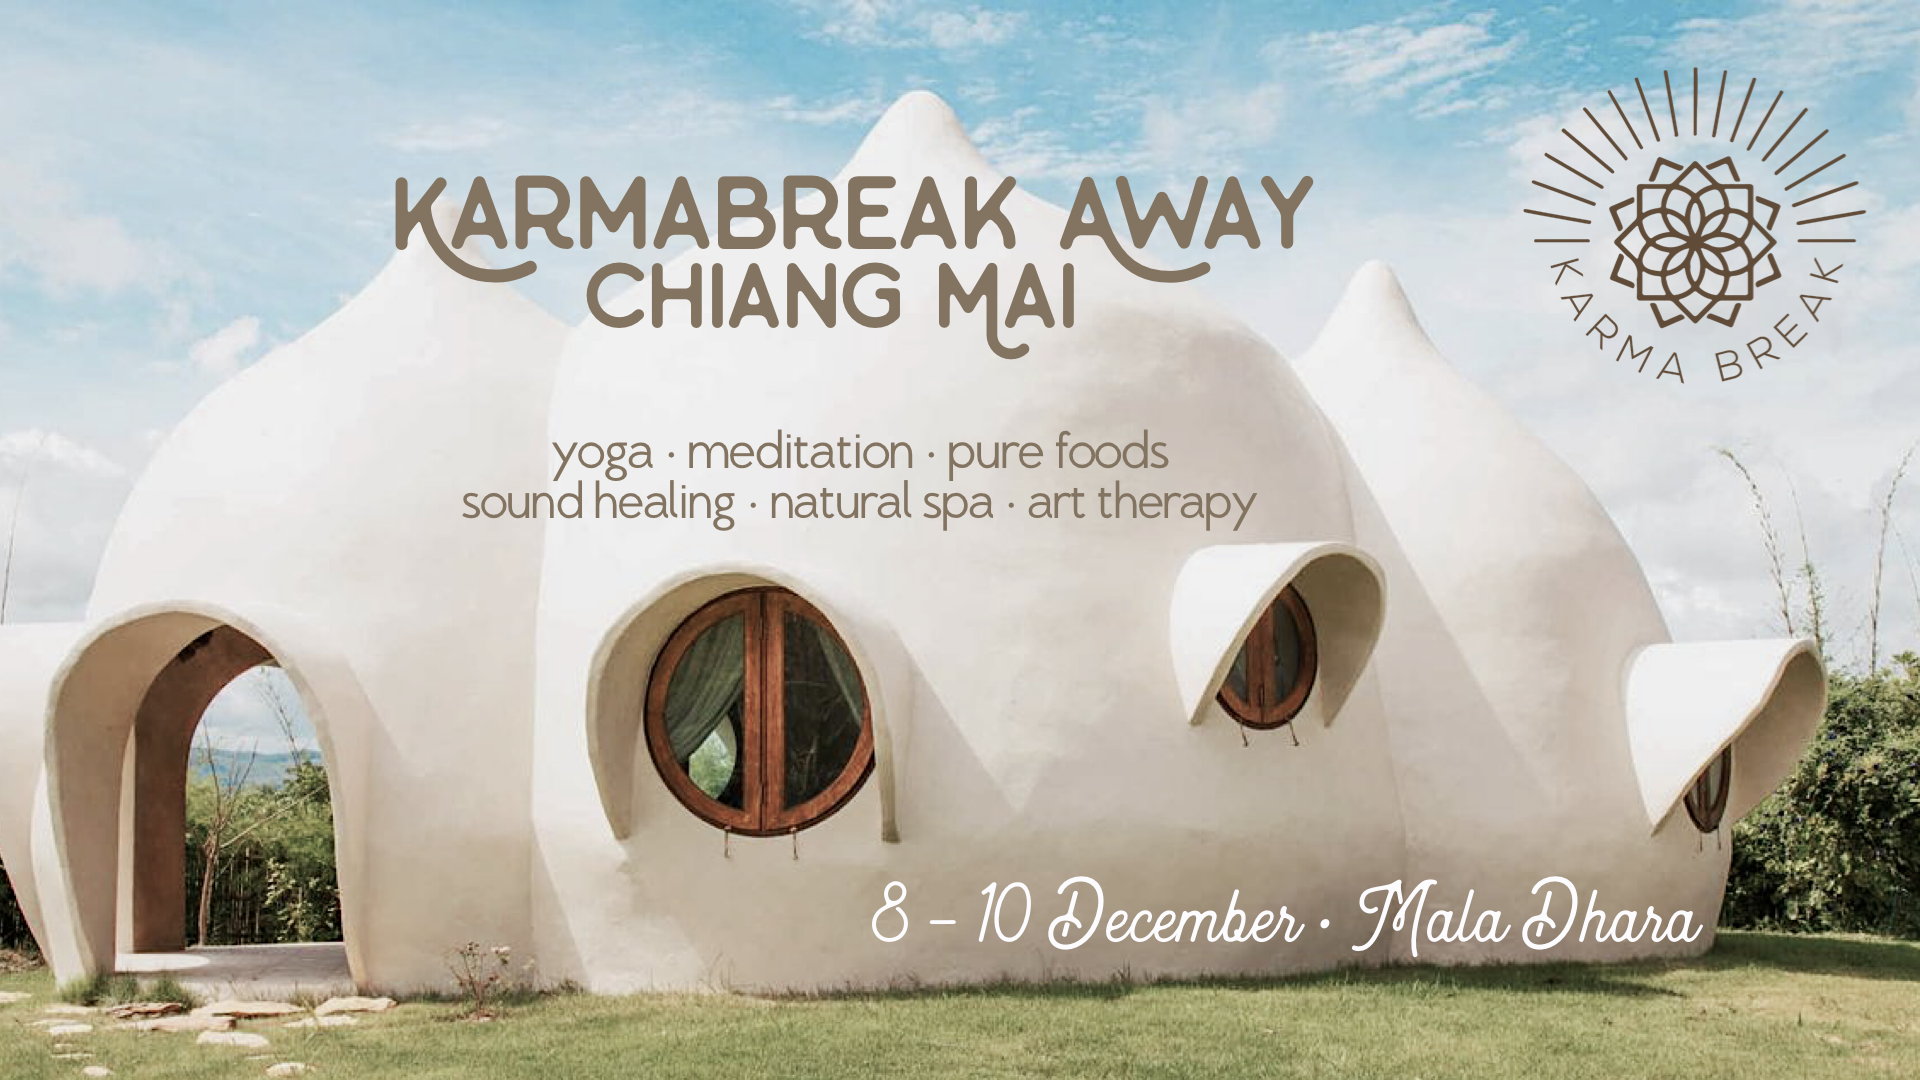 Karma Break Yoga Retreat at Chiang mai Mala Dhara Yoga Retreat Center